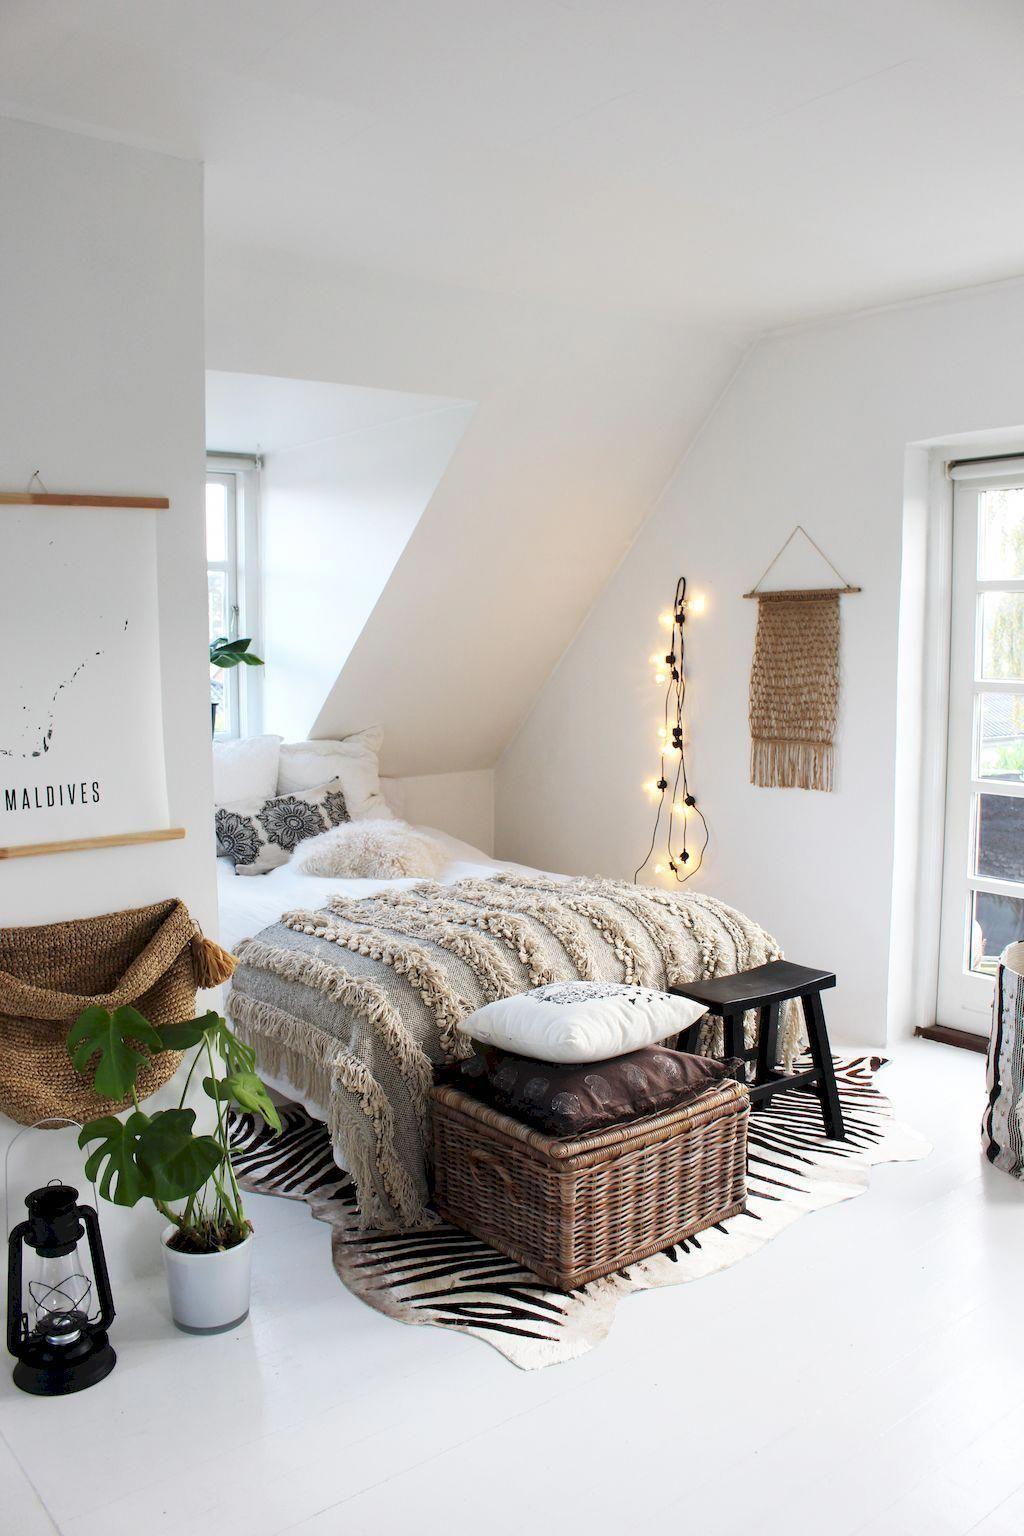 modernhomedecordiy bedroom decor cozy minimalist on modern cozy bedroom decorating ideas id=91128